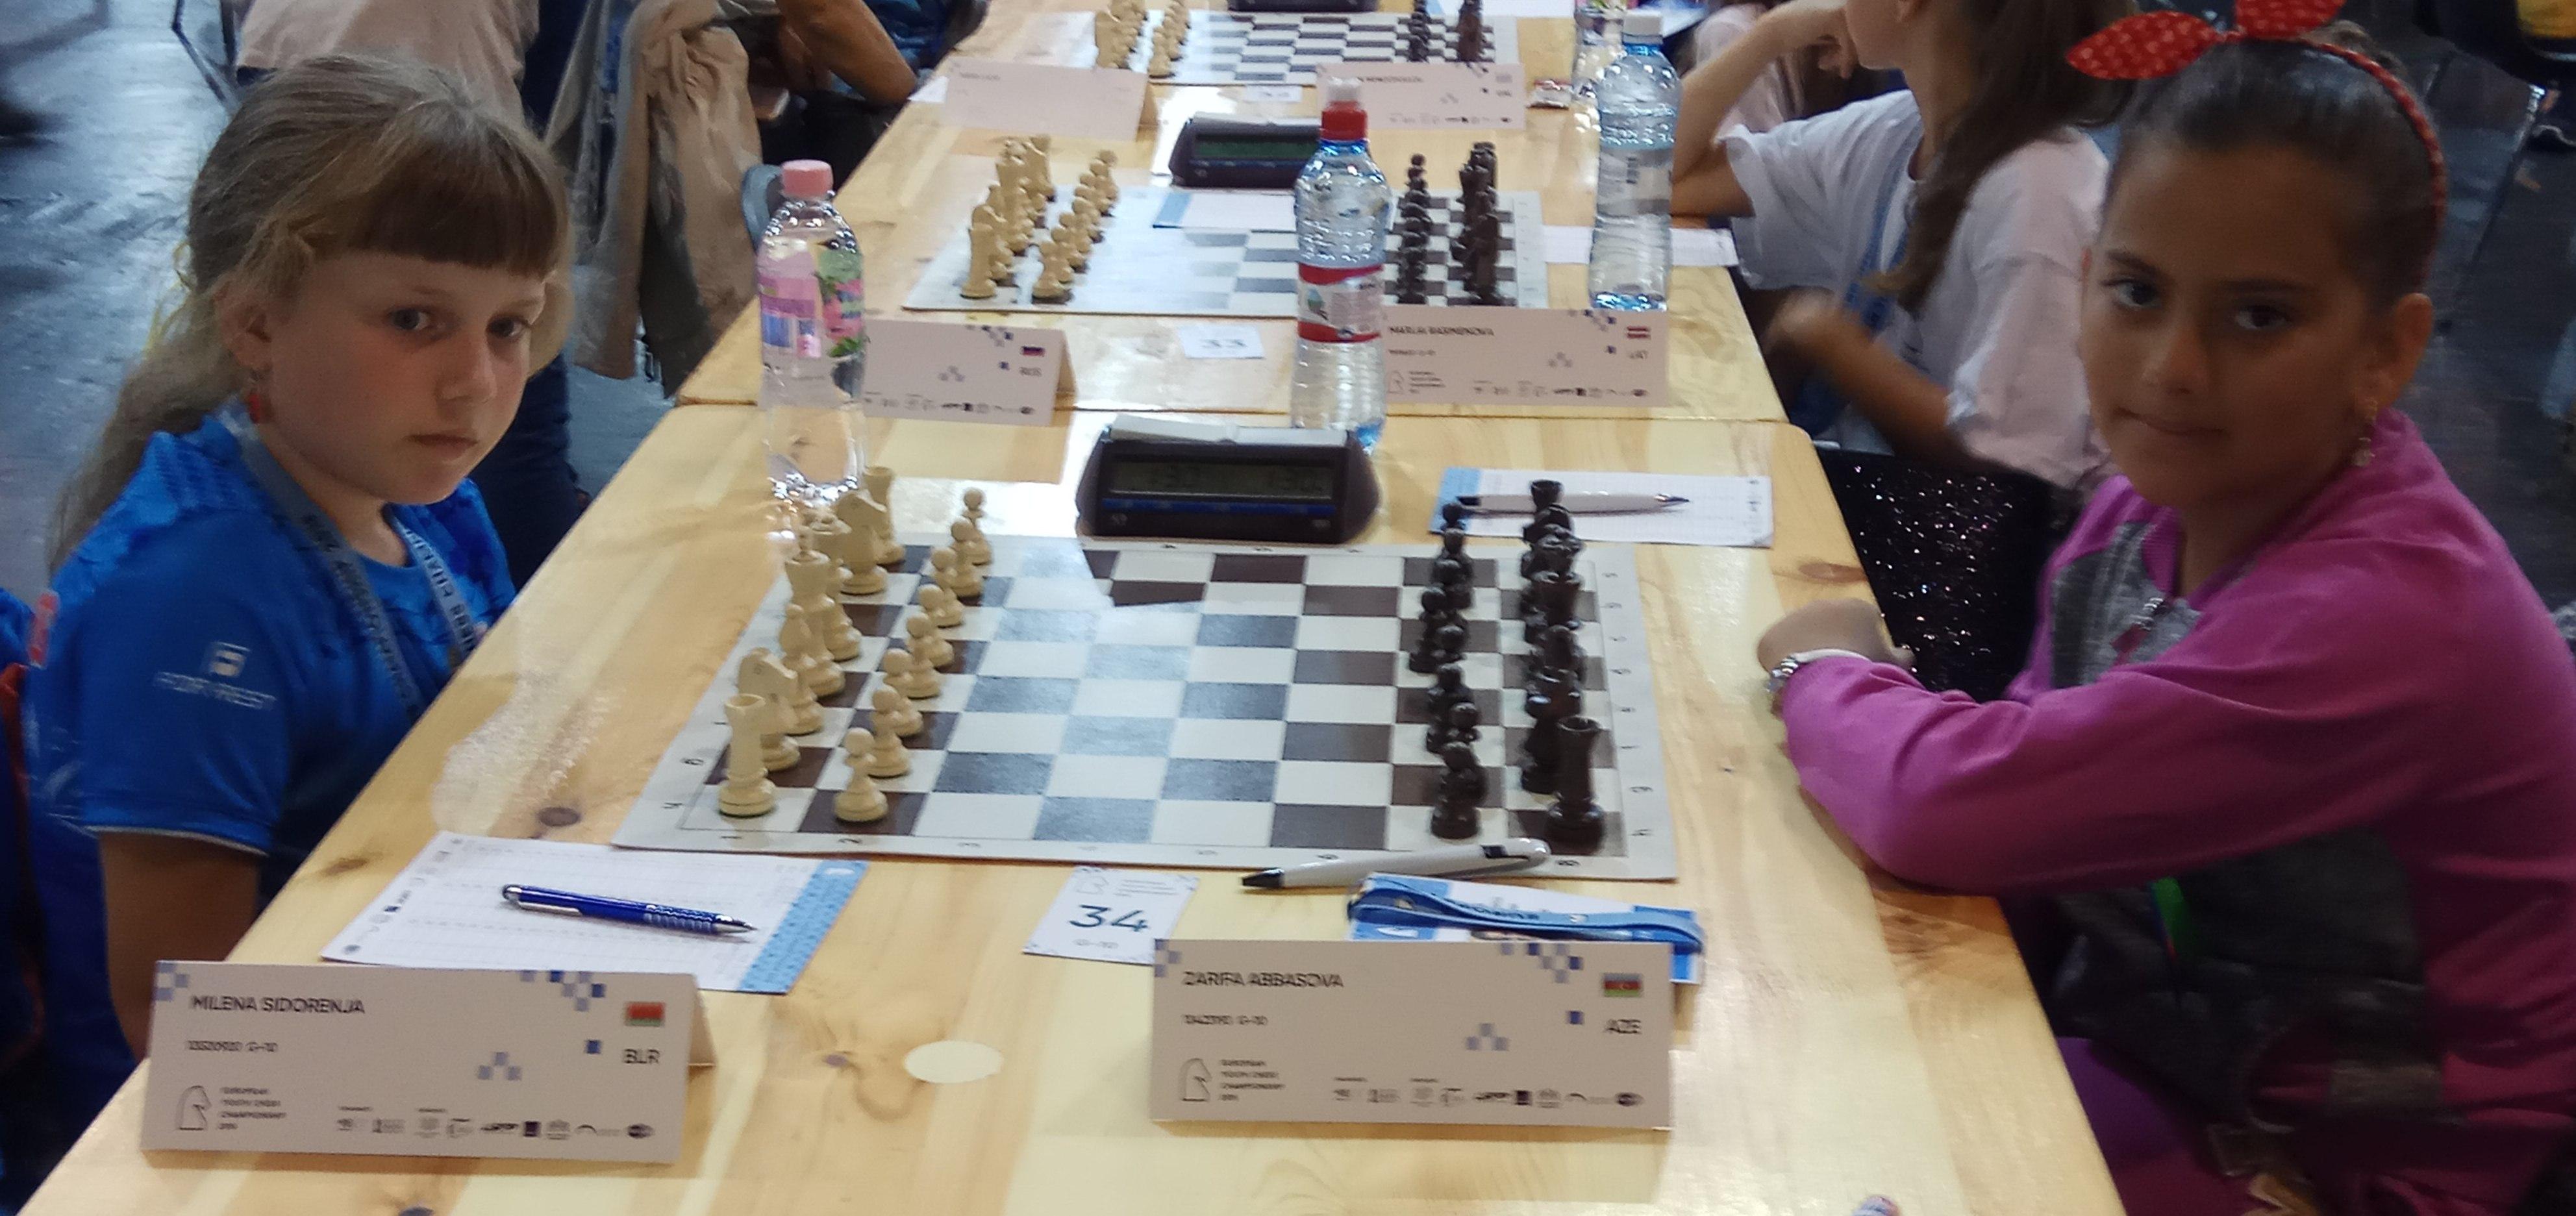 Милена Сидореня перед победной партией с шахматисткой из Азербайджана.